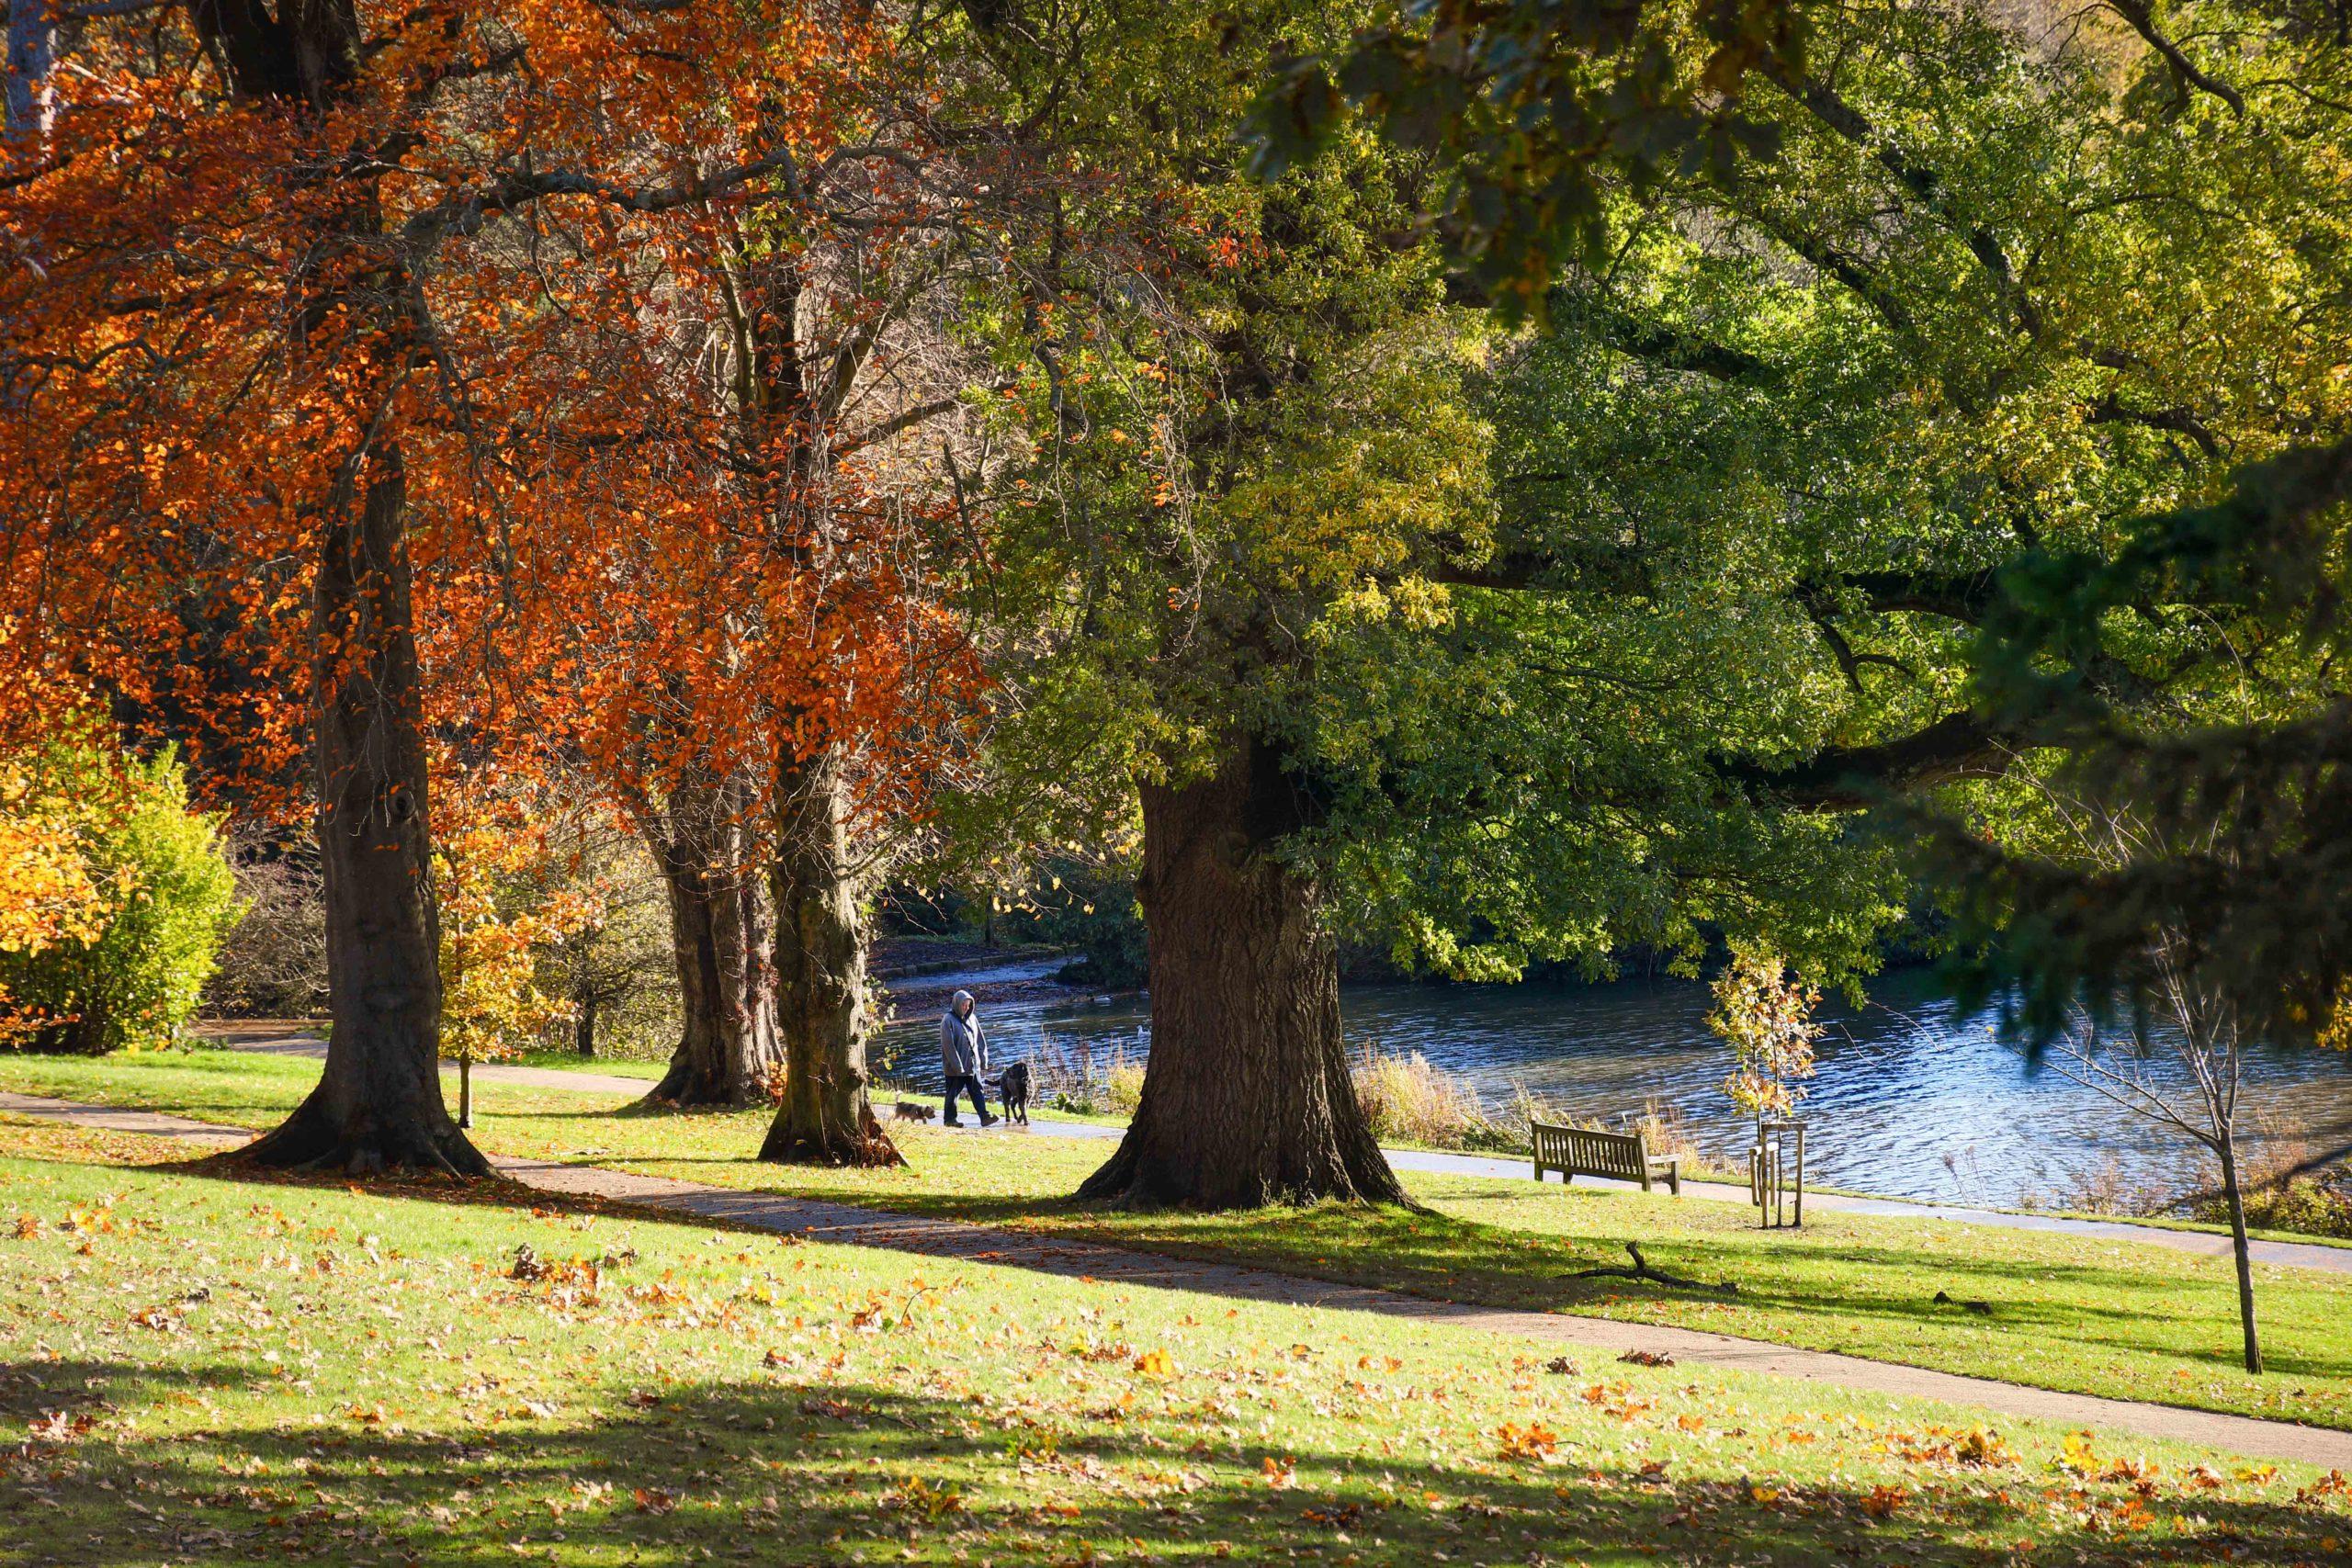 Dunorlan Park à Royal Tunbridge Wells © French Moments